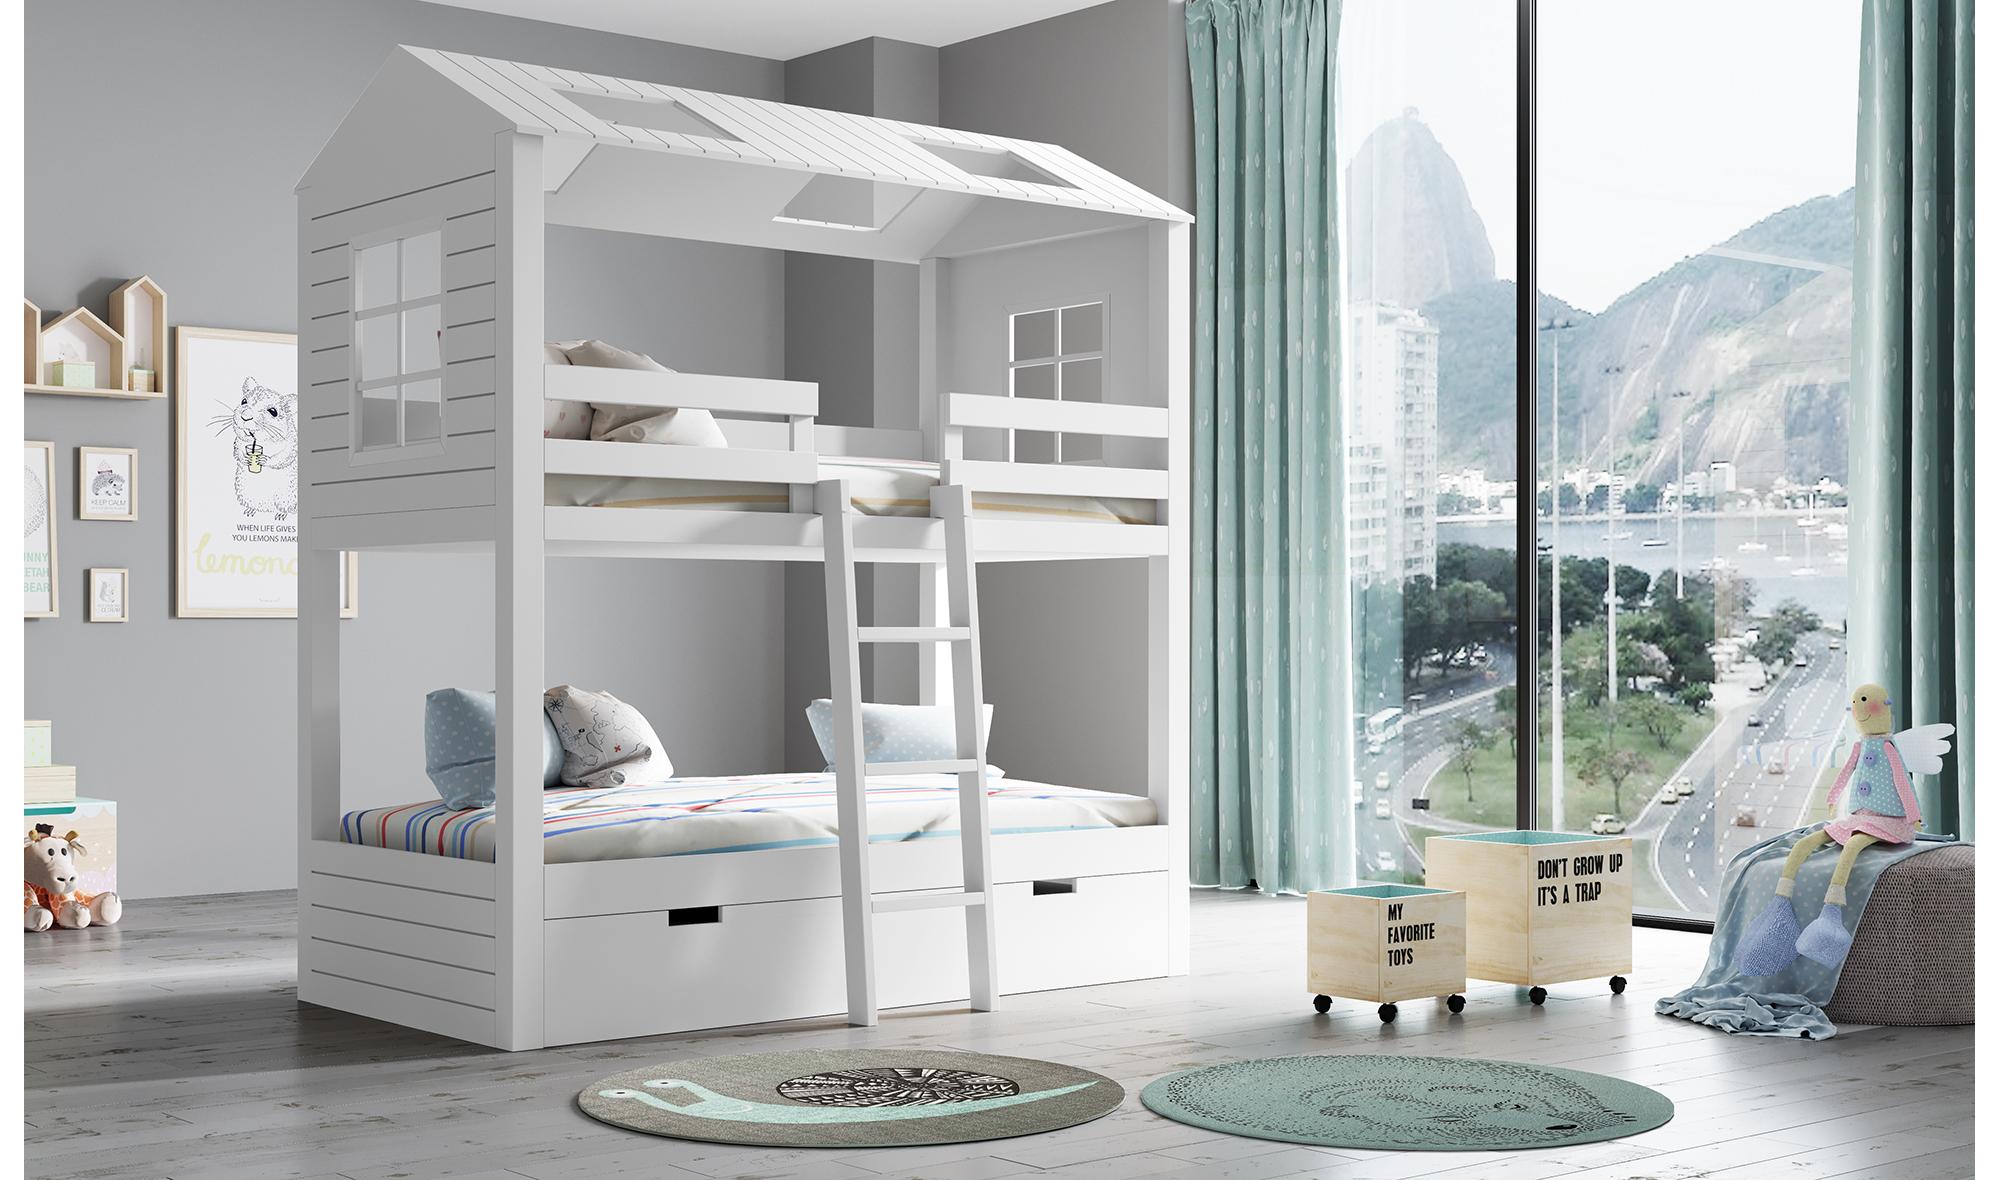 Litera infantil 3 camas 2 aguas casita en cosas de for Muebles literas infantiles